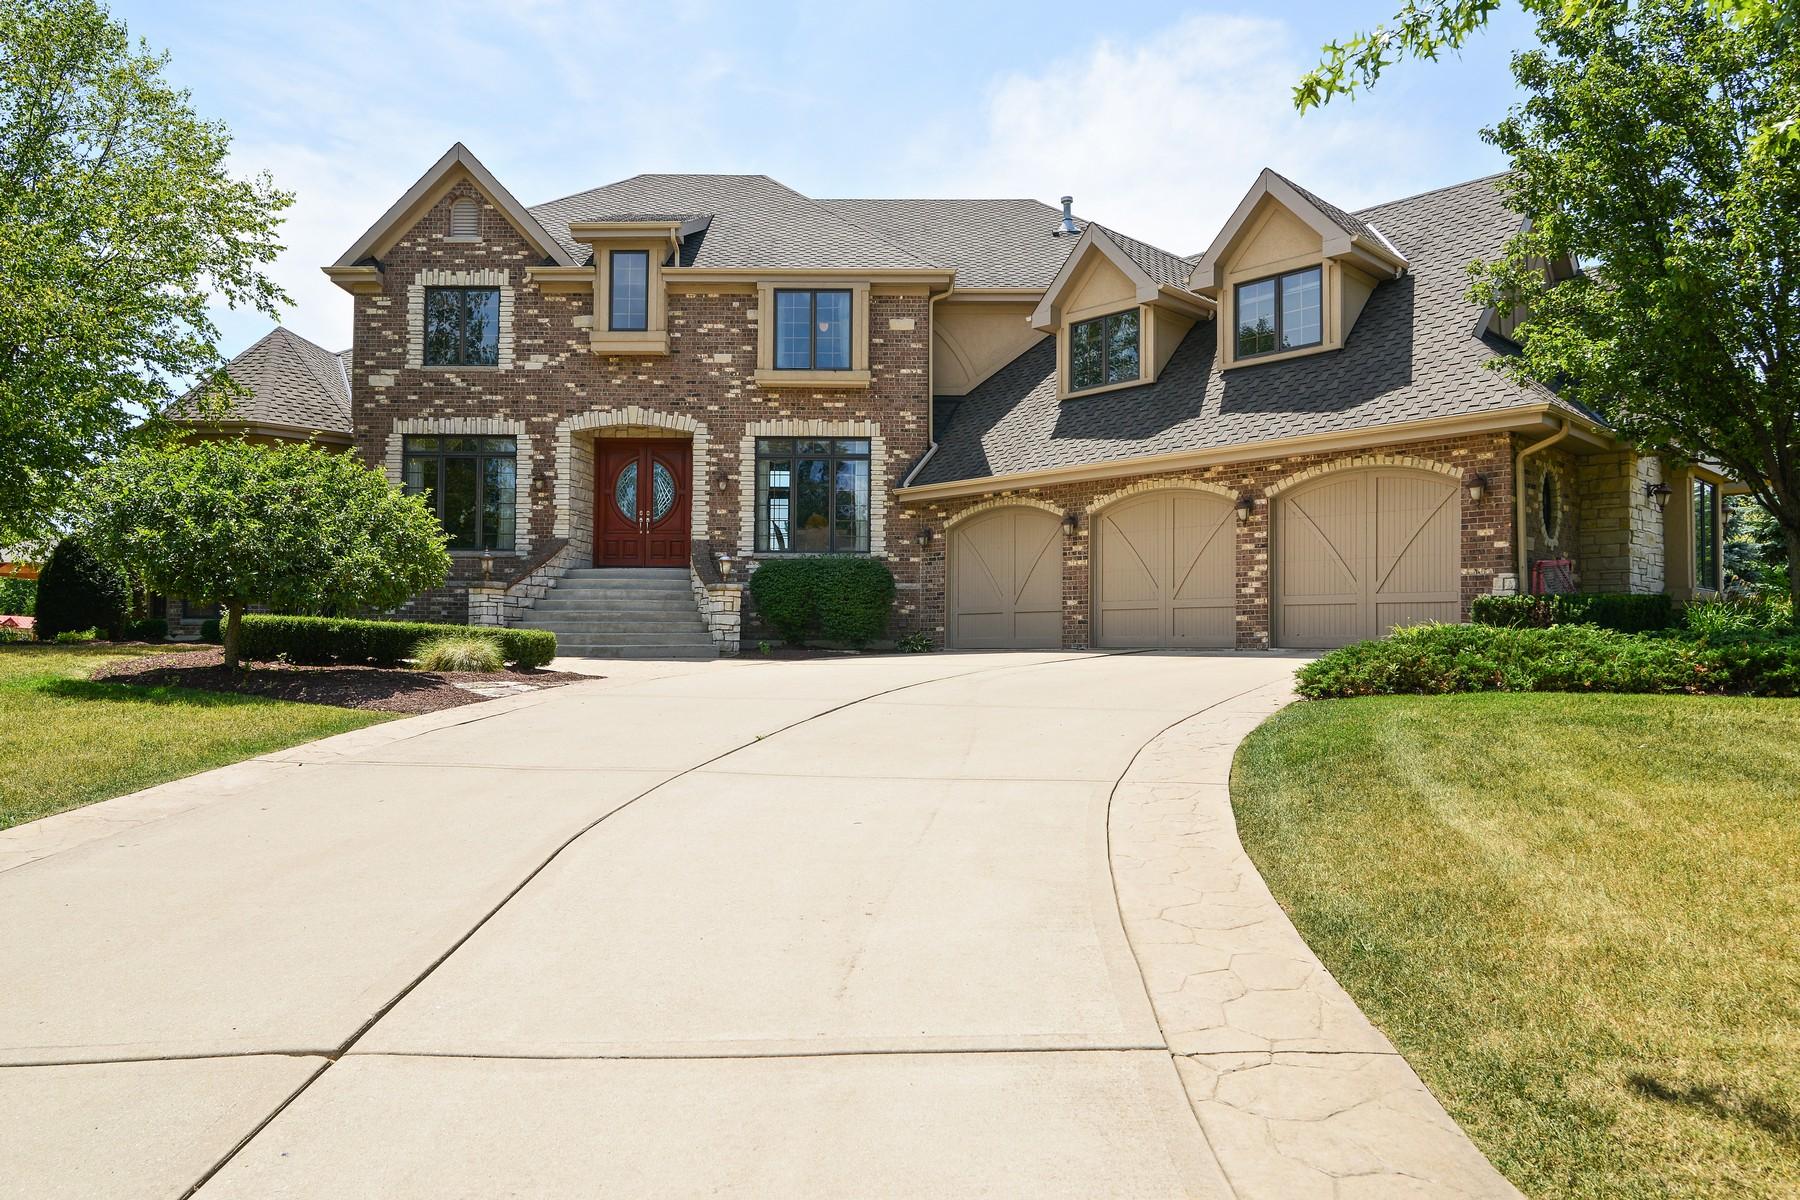 Moradia para Venda às Magnificent Custom Built Home 374 S Walnut Ridge Court Frankfort, Illinois, 60423 Estados Unidos